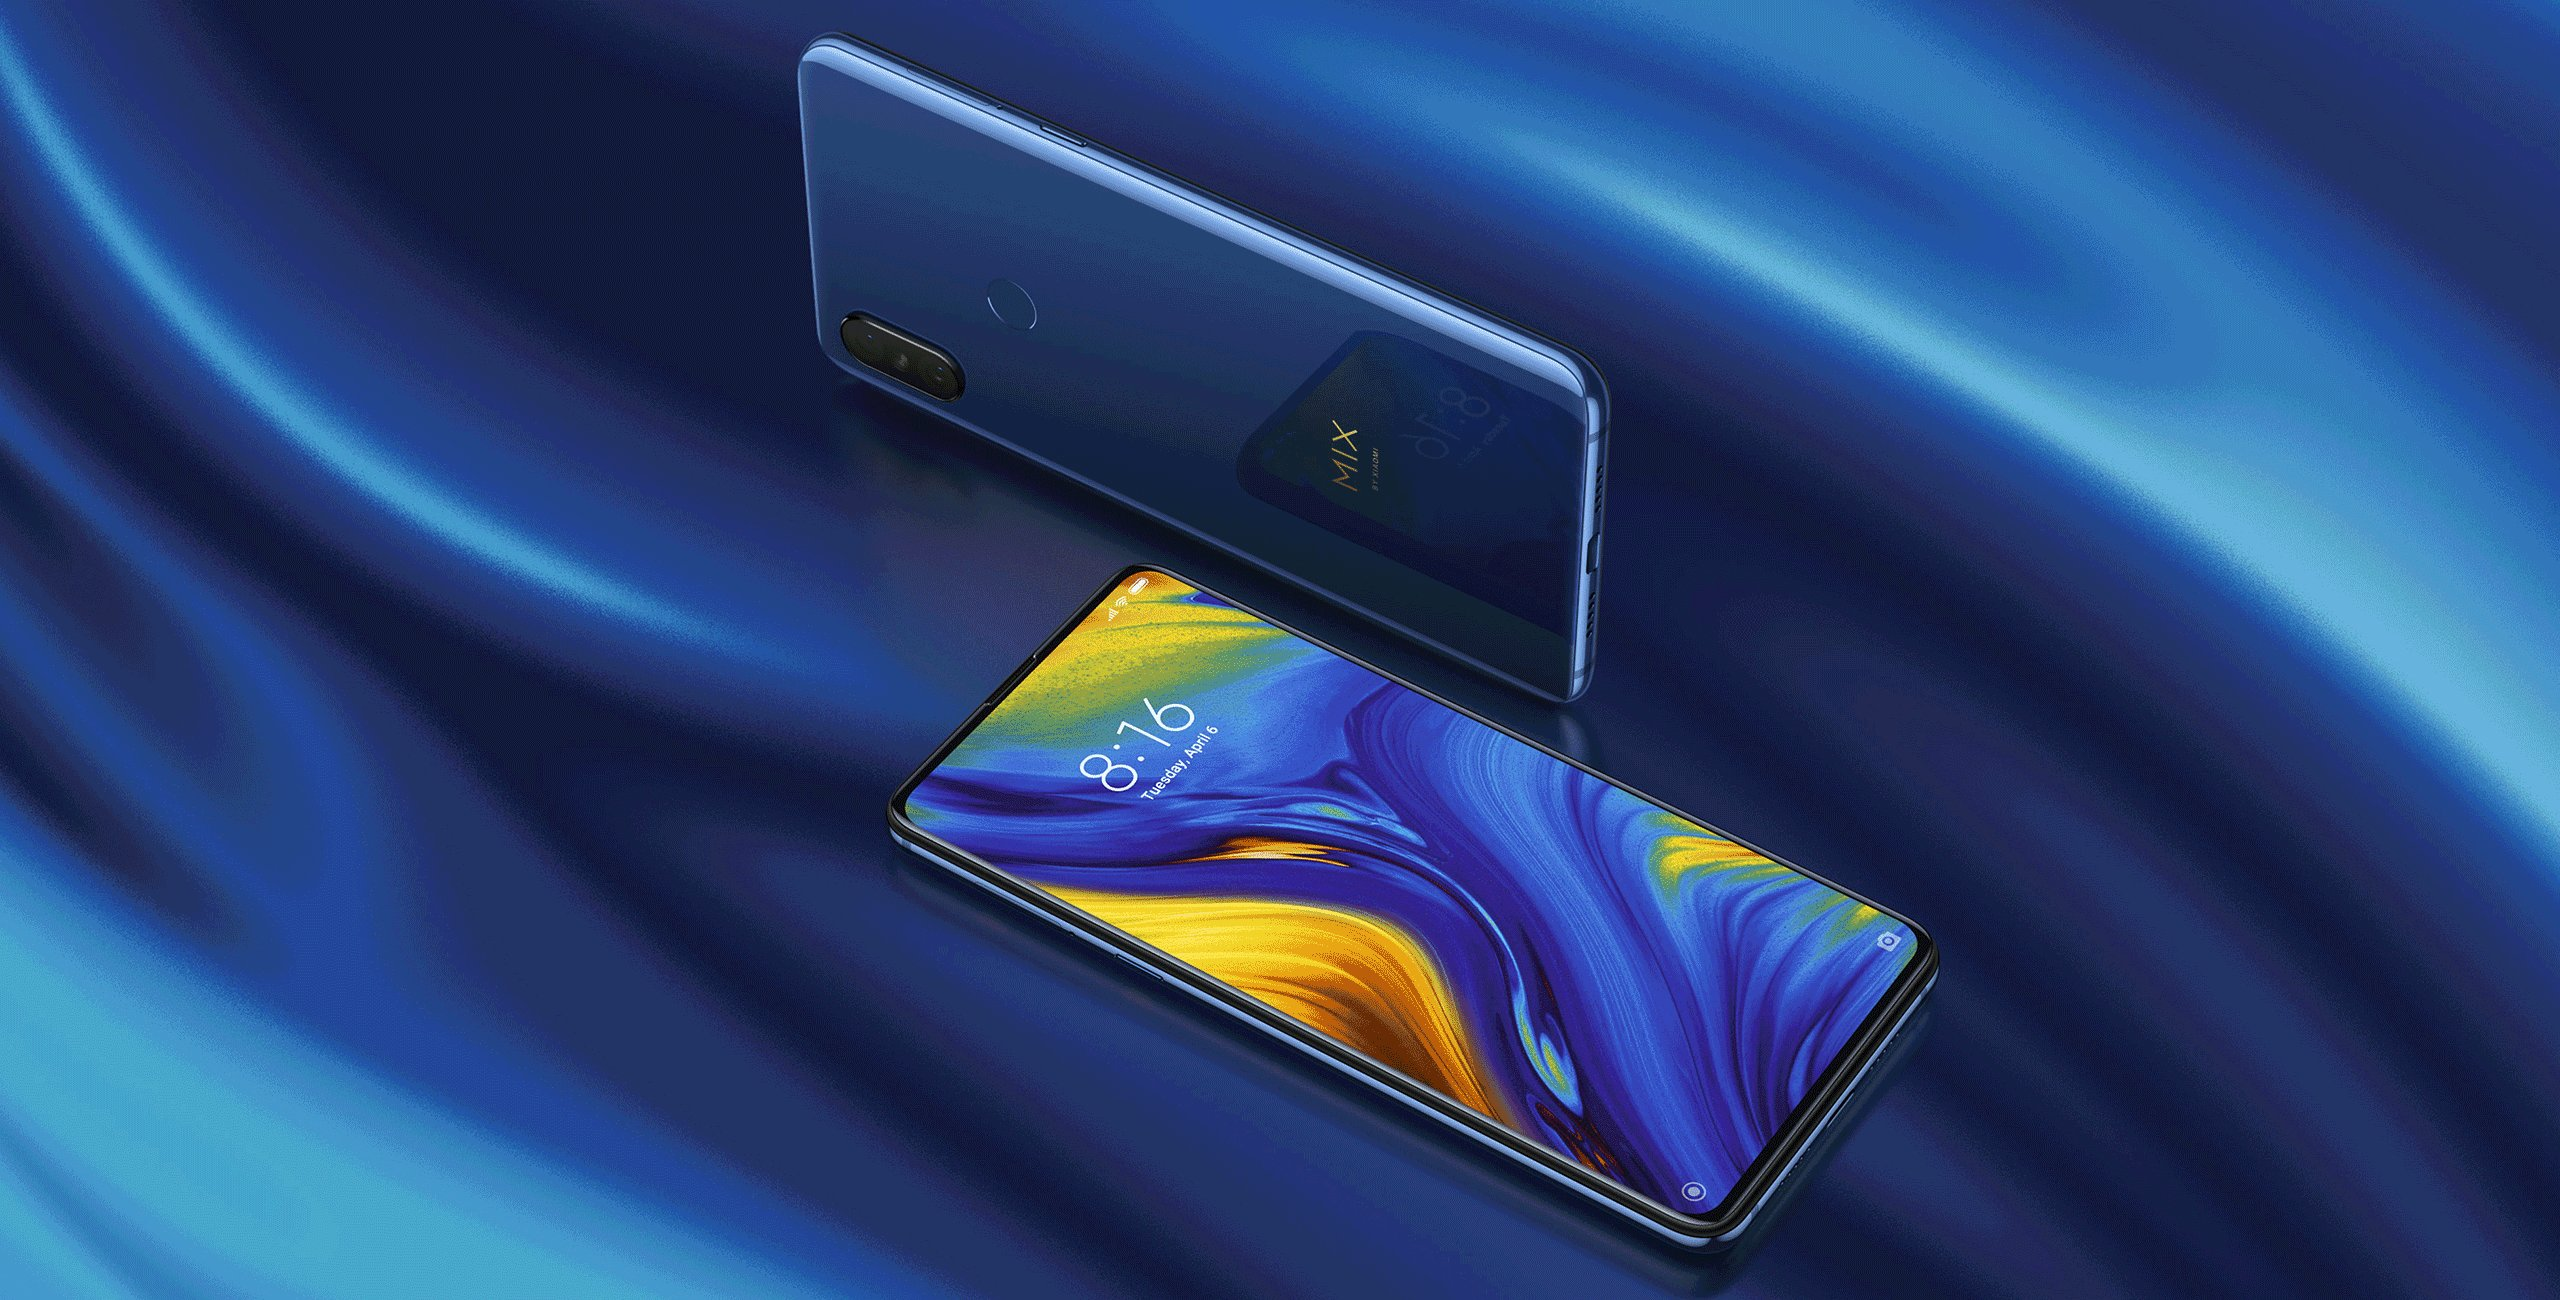 Smartphone Mi MIX 3 - 6+128GB - versiunea Global, Albastră